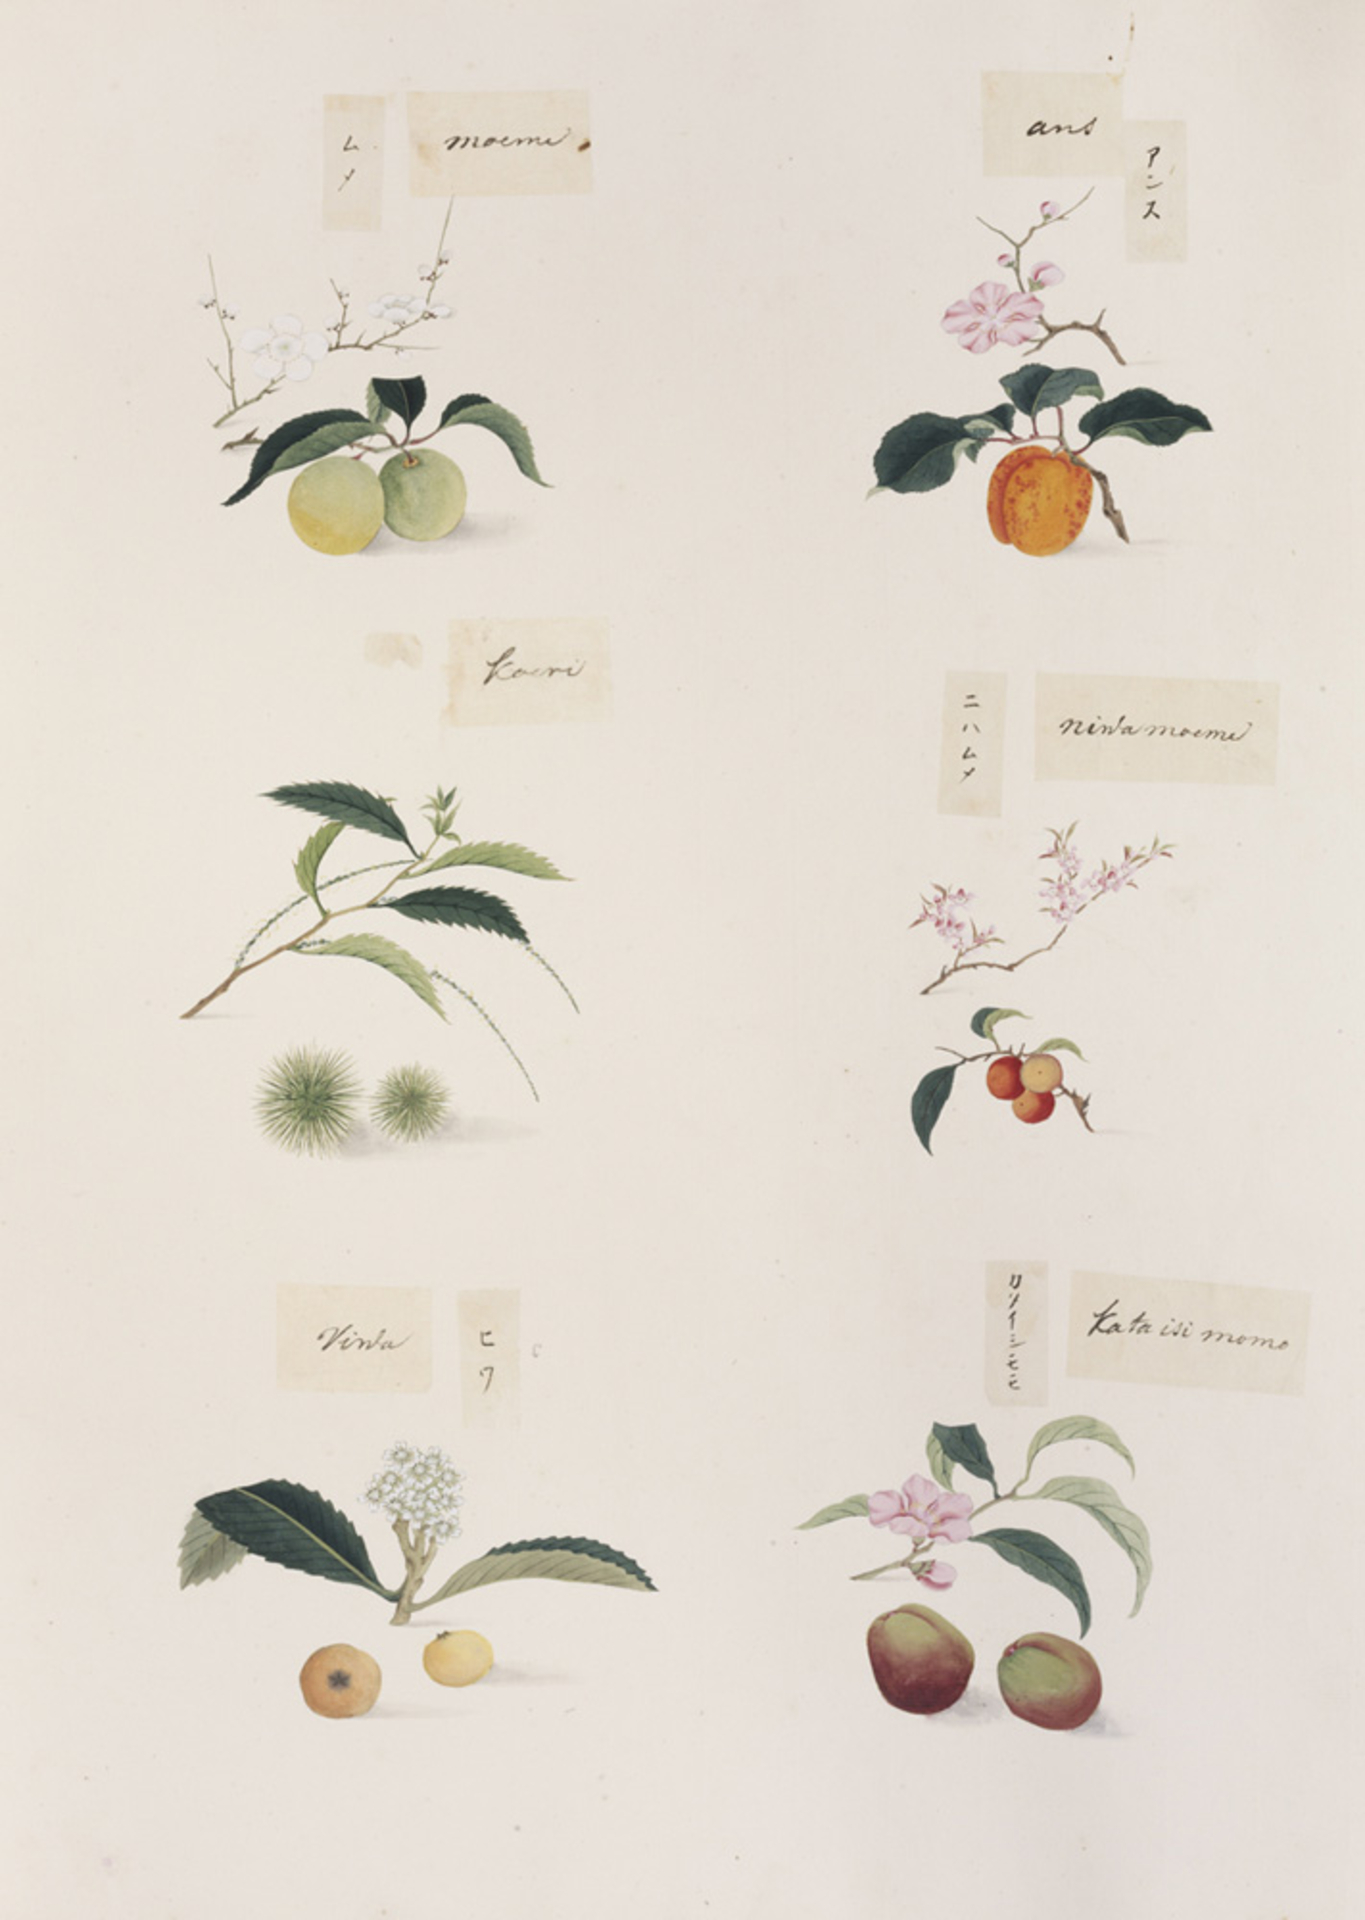 RMNH.ART.277 | Prunus mume